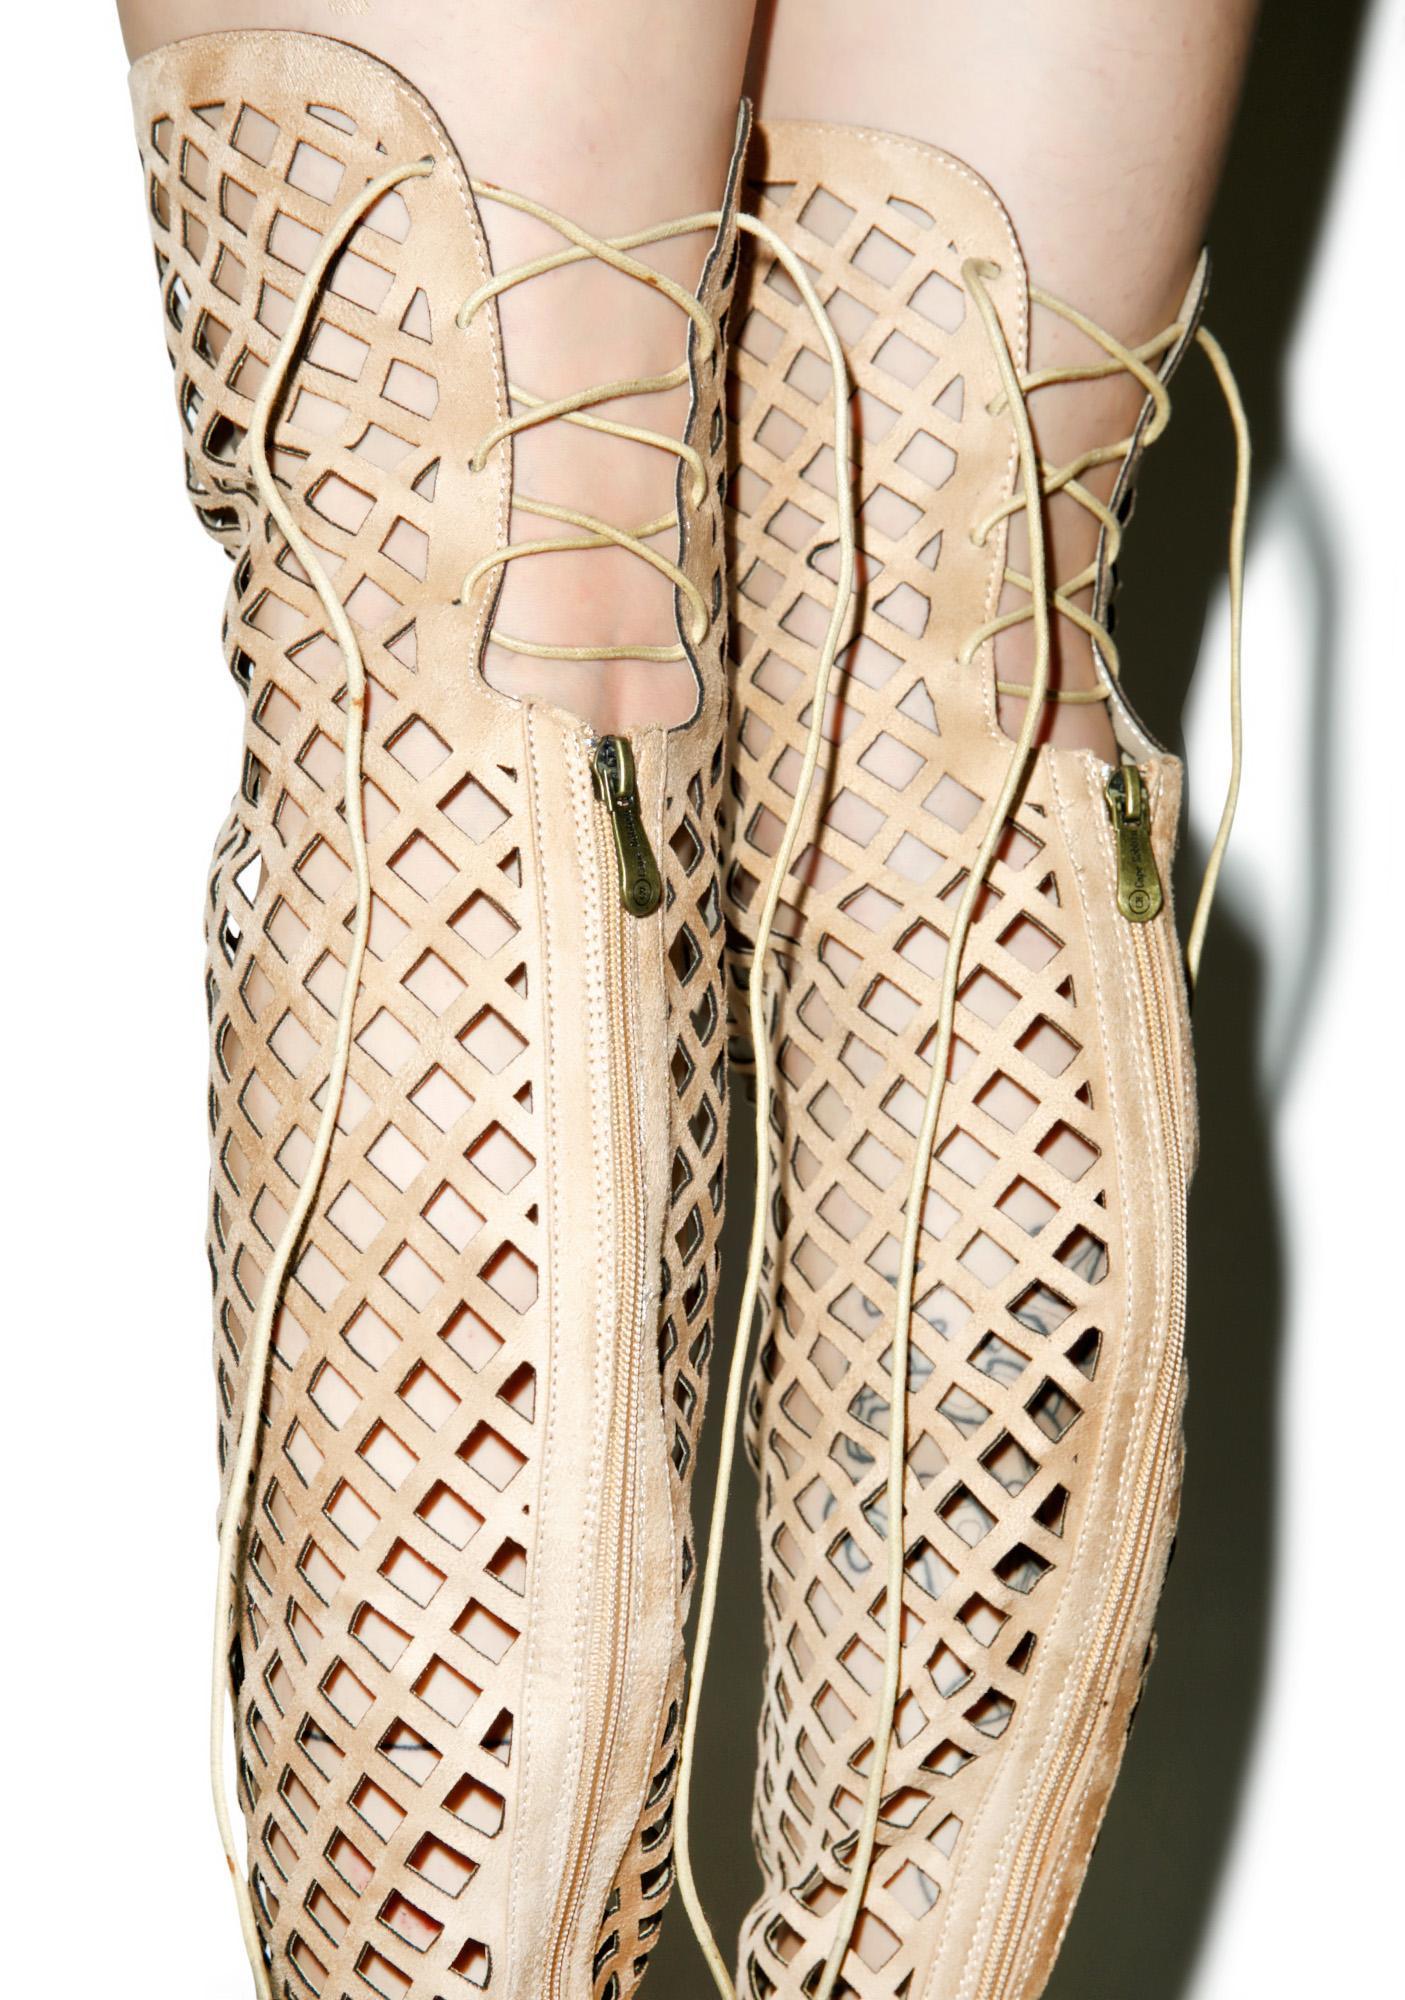 Honeycomb Thigh High Heels